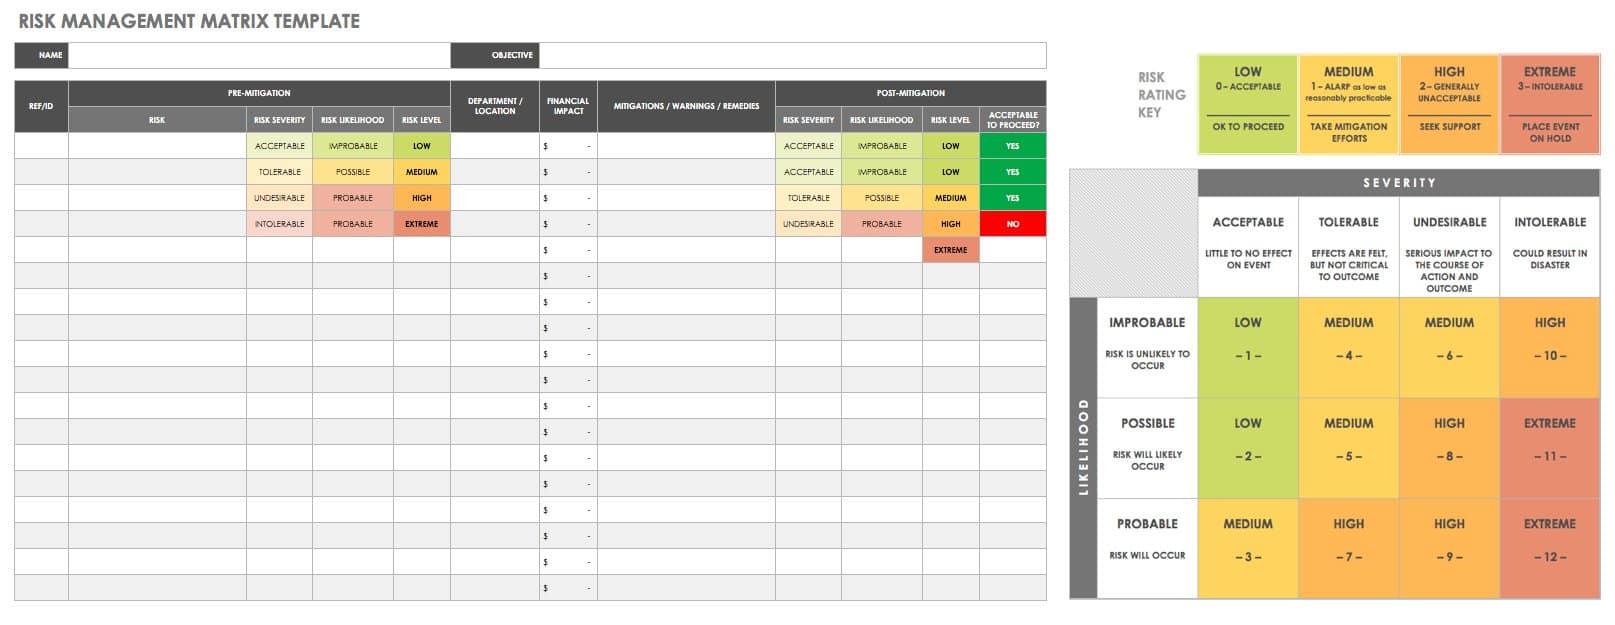 All about operational audits smartsheet risk analysis matrix template maxwellsz